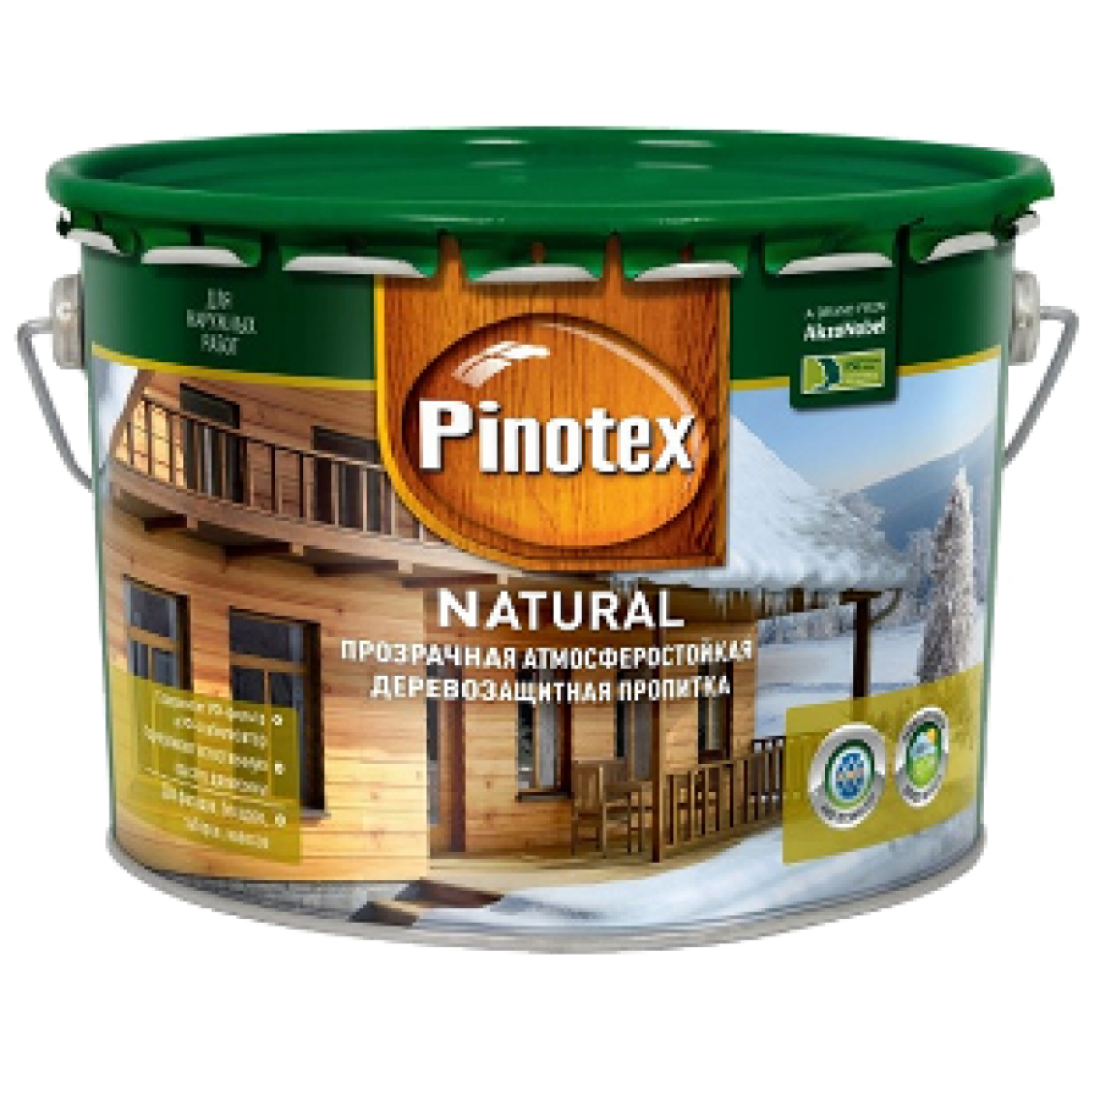 PINOTEX NATURAL антисептик, атмосфероустойчивый, УФ защита (1л)